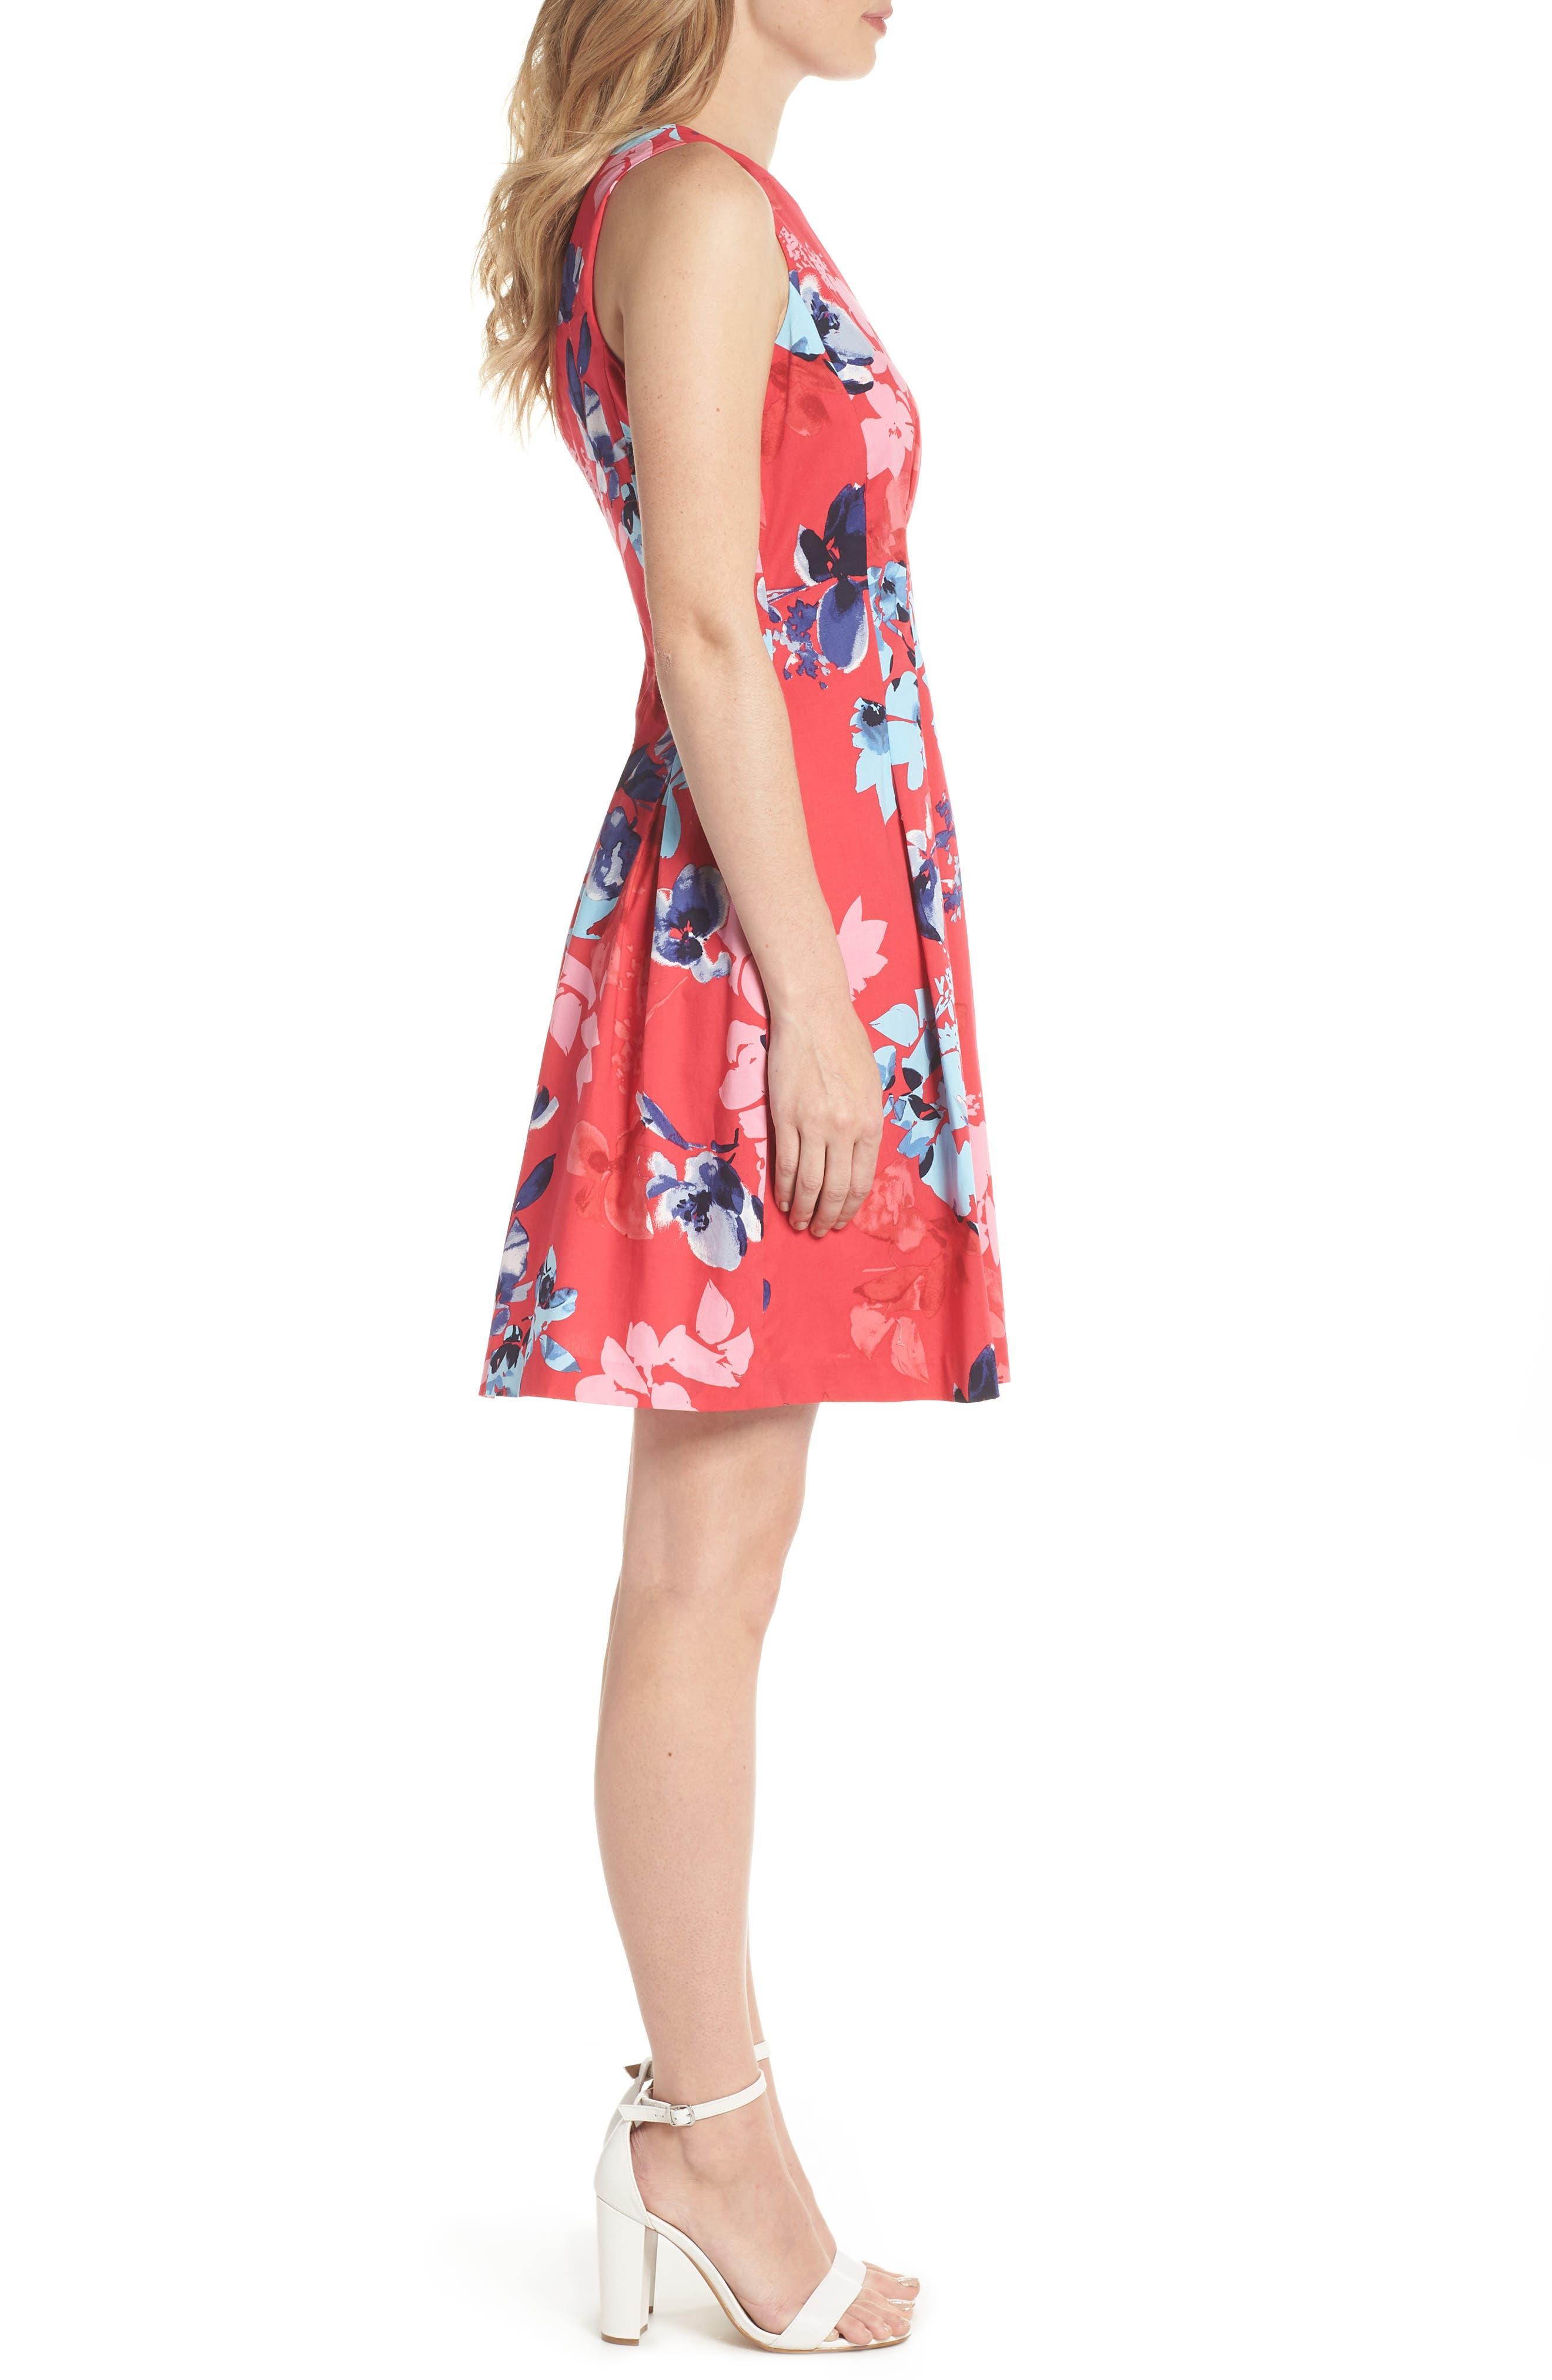 VINCE CAMUTO,                             Floral Cotton Fit & Flare Dress,                             Alternate thumbnail 3, color,                             653